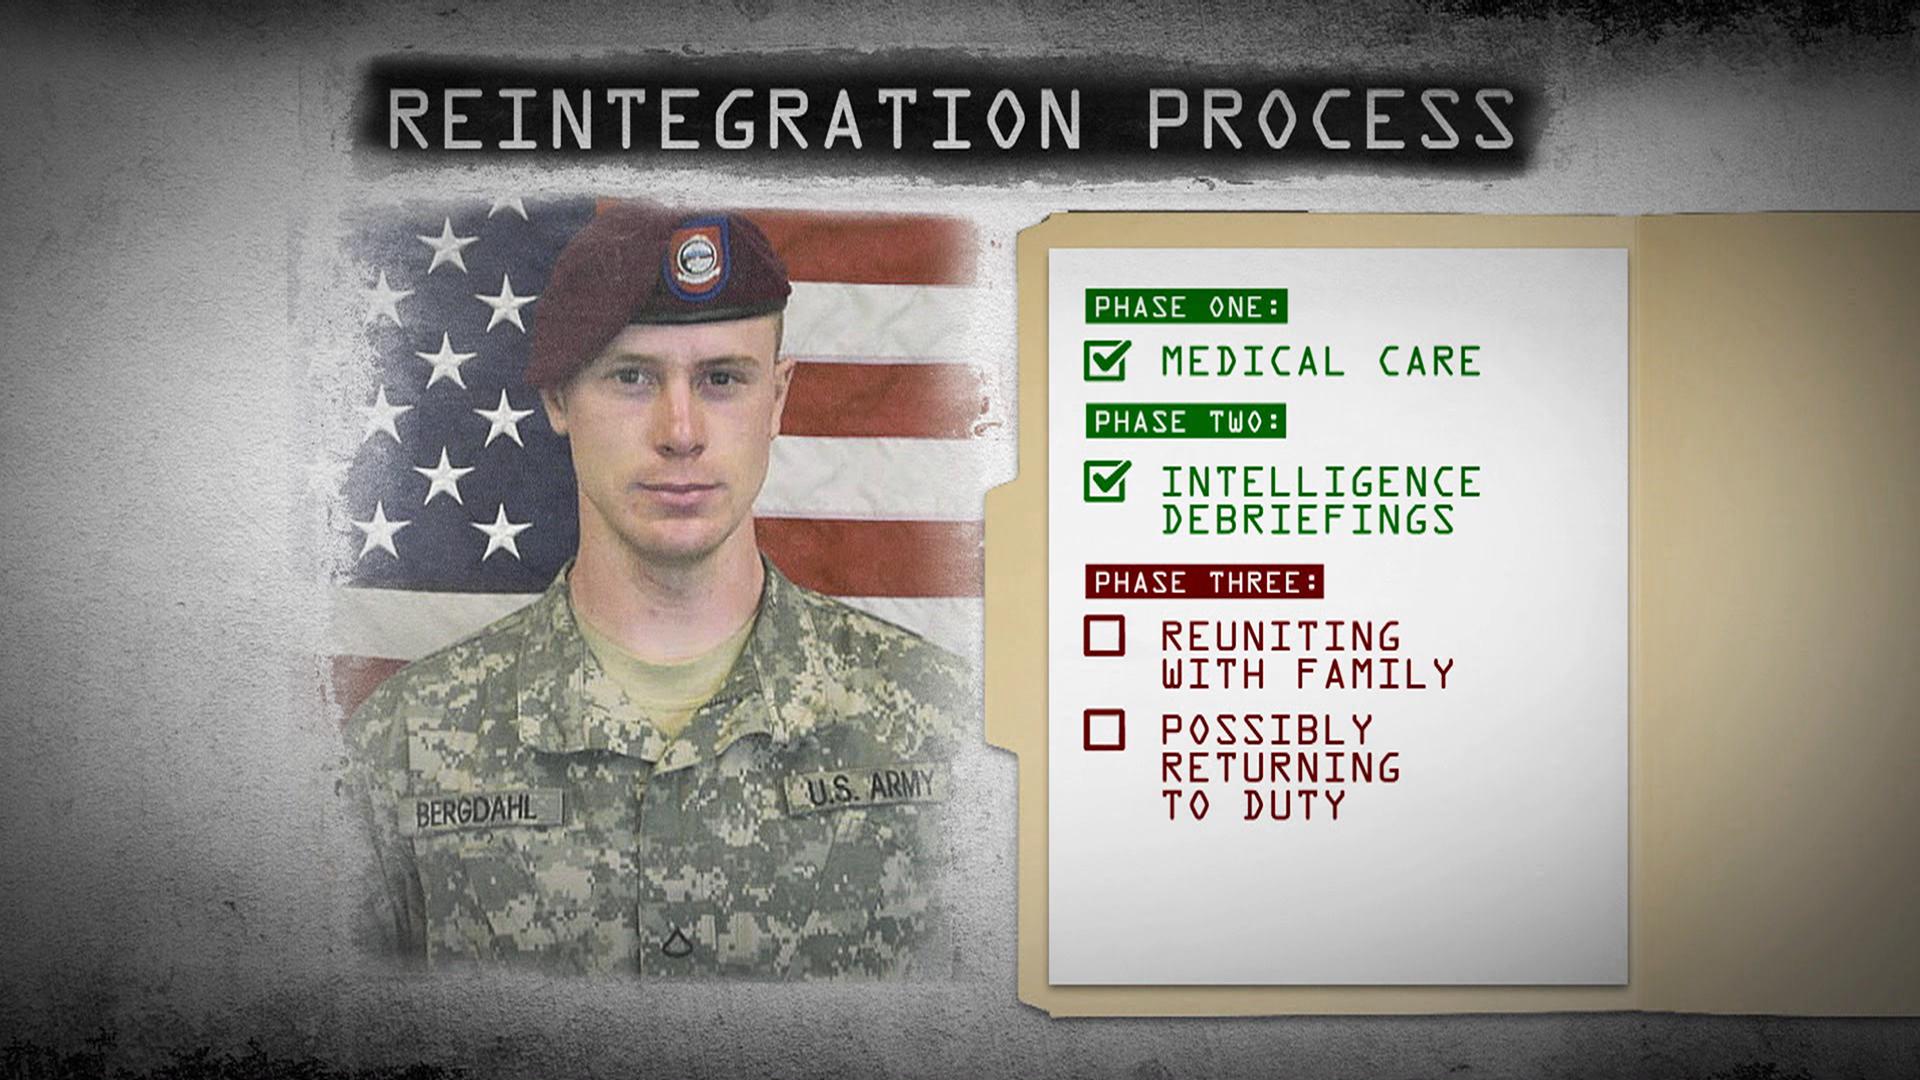 Essay On Reintergration Of Prisoners